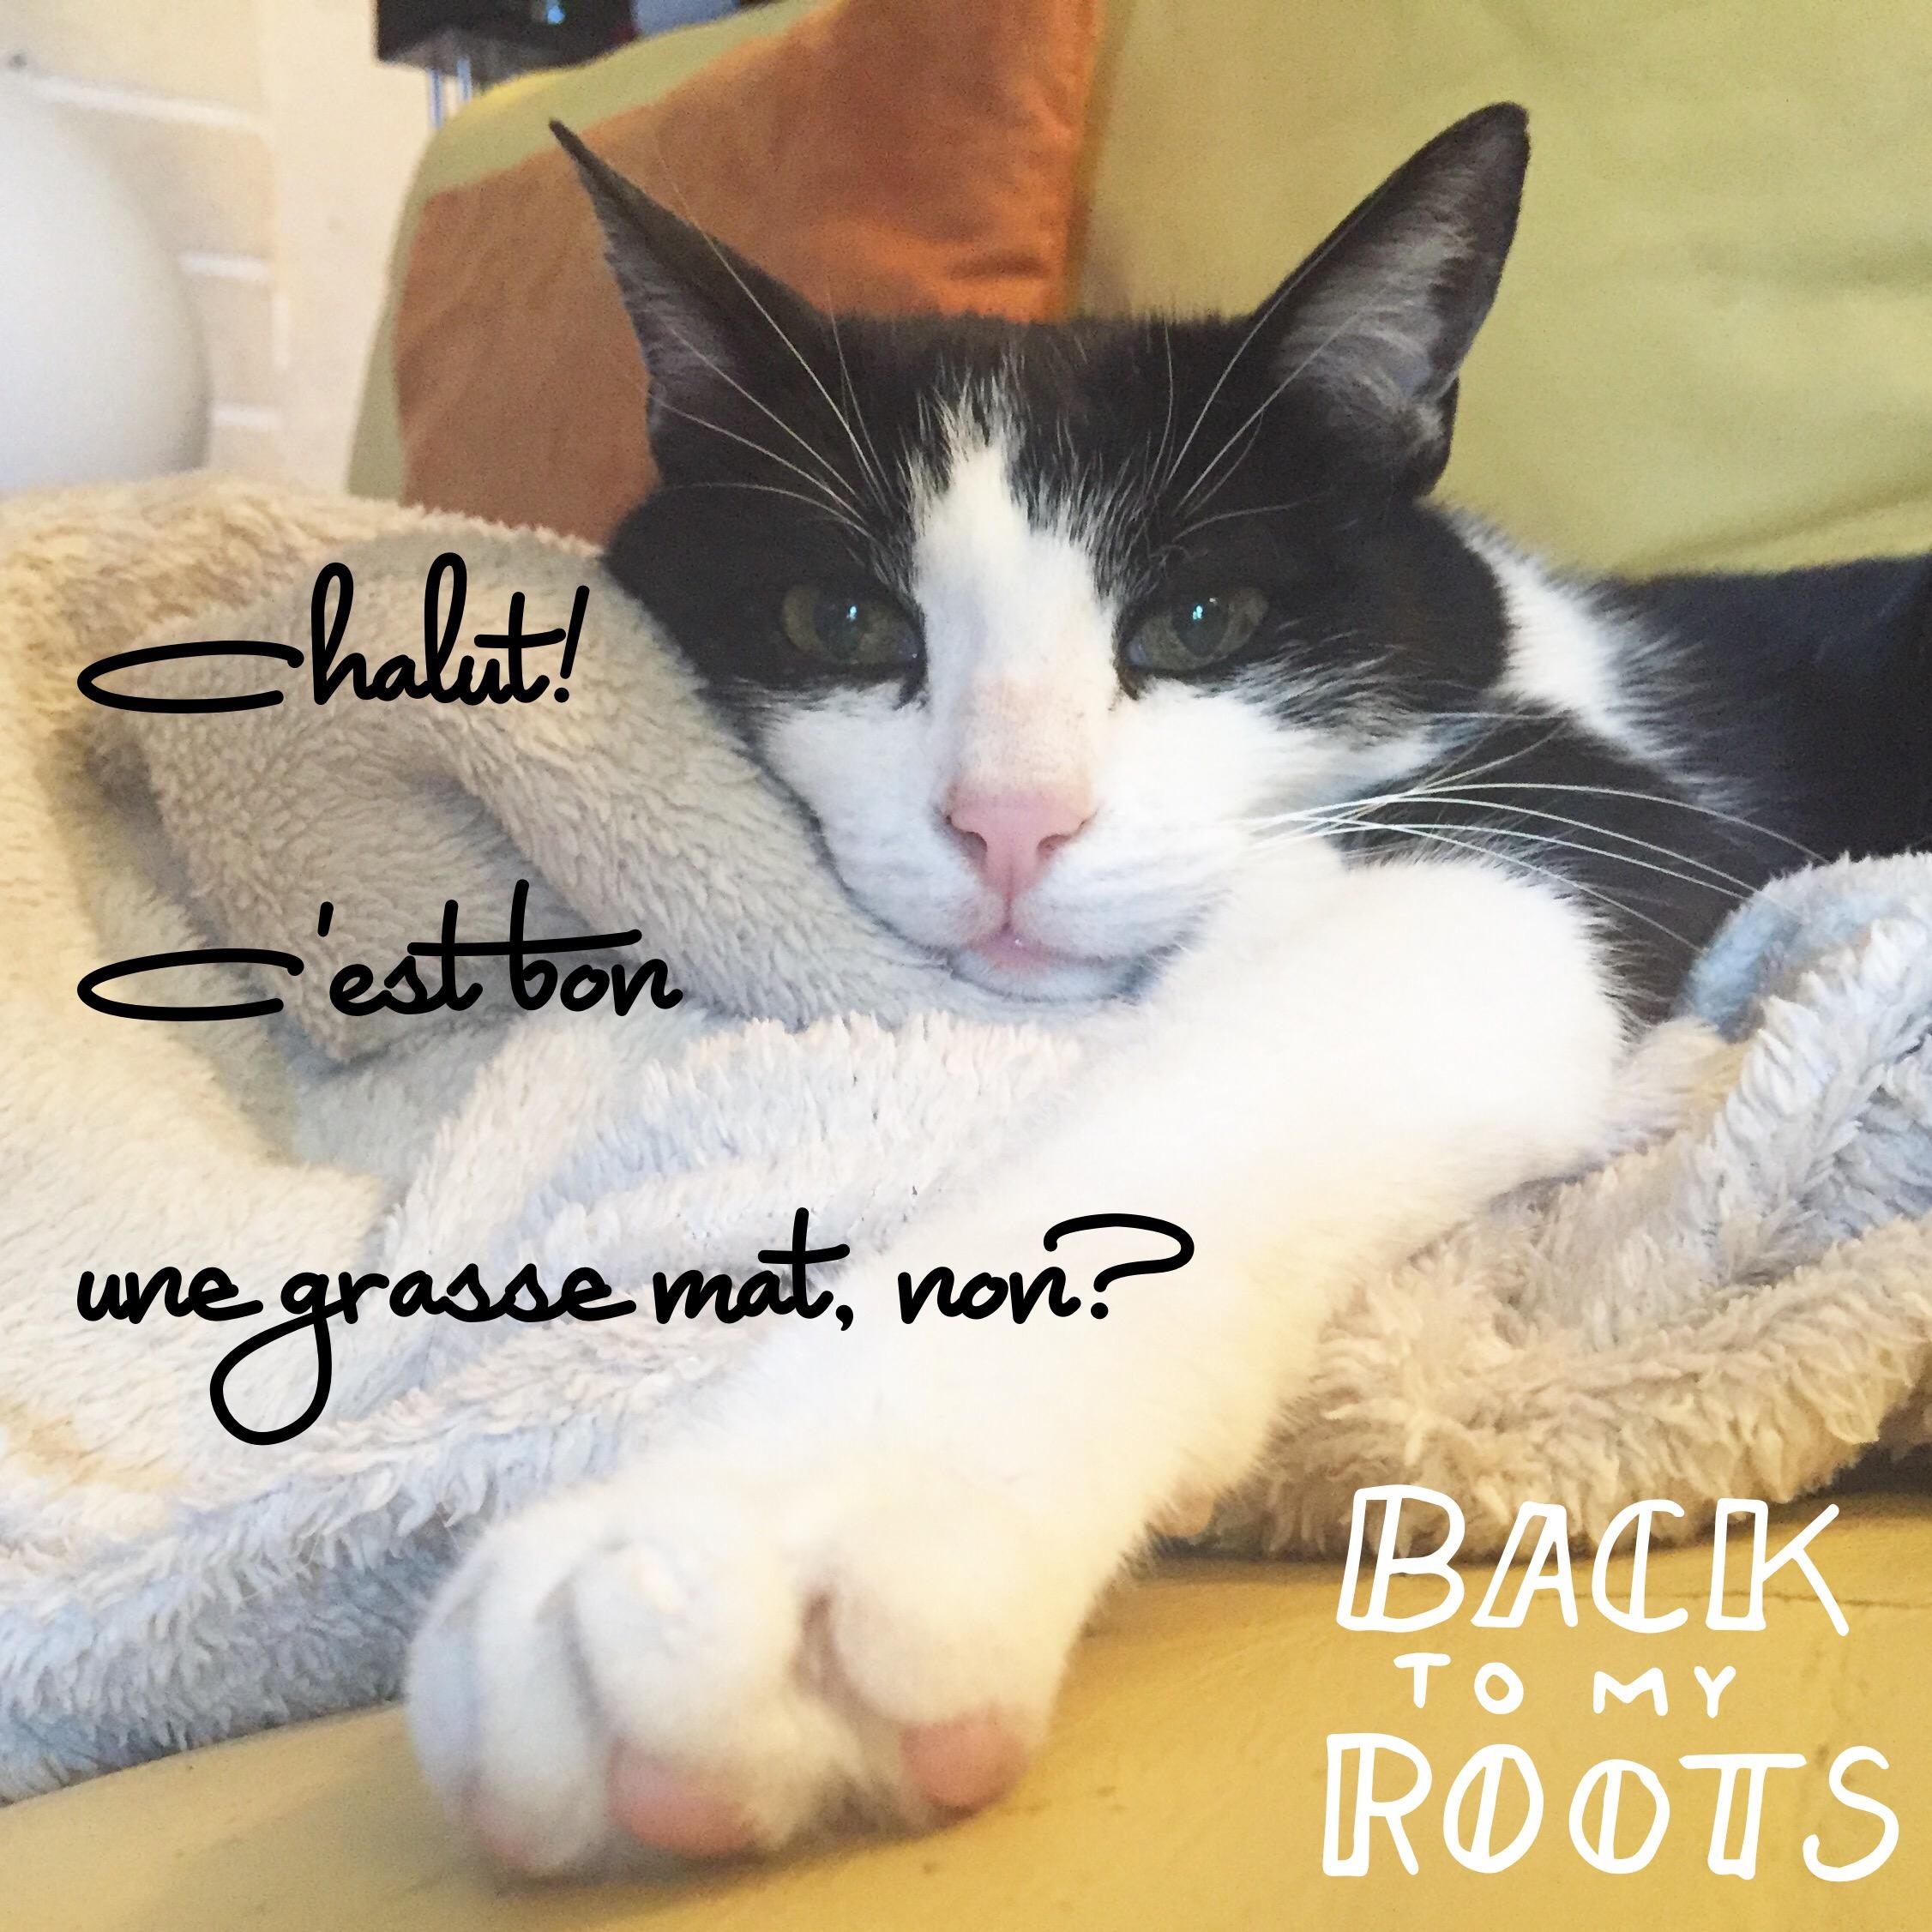 Vie de chat: Flip fan de grasse mat!